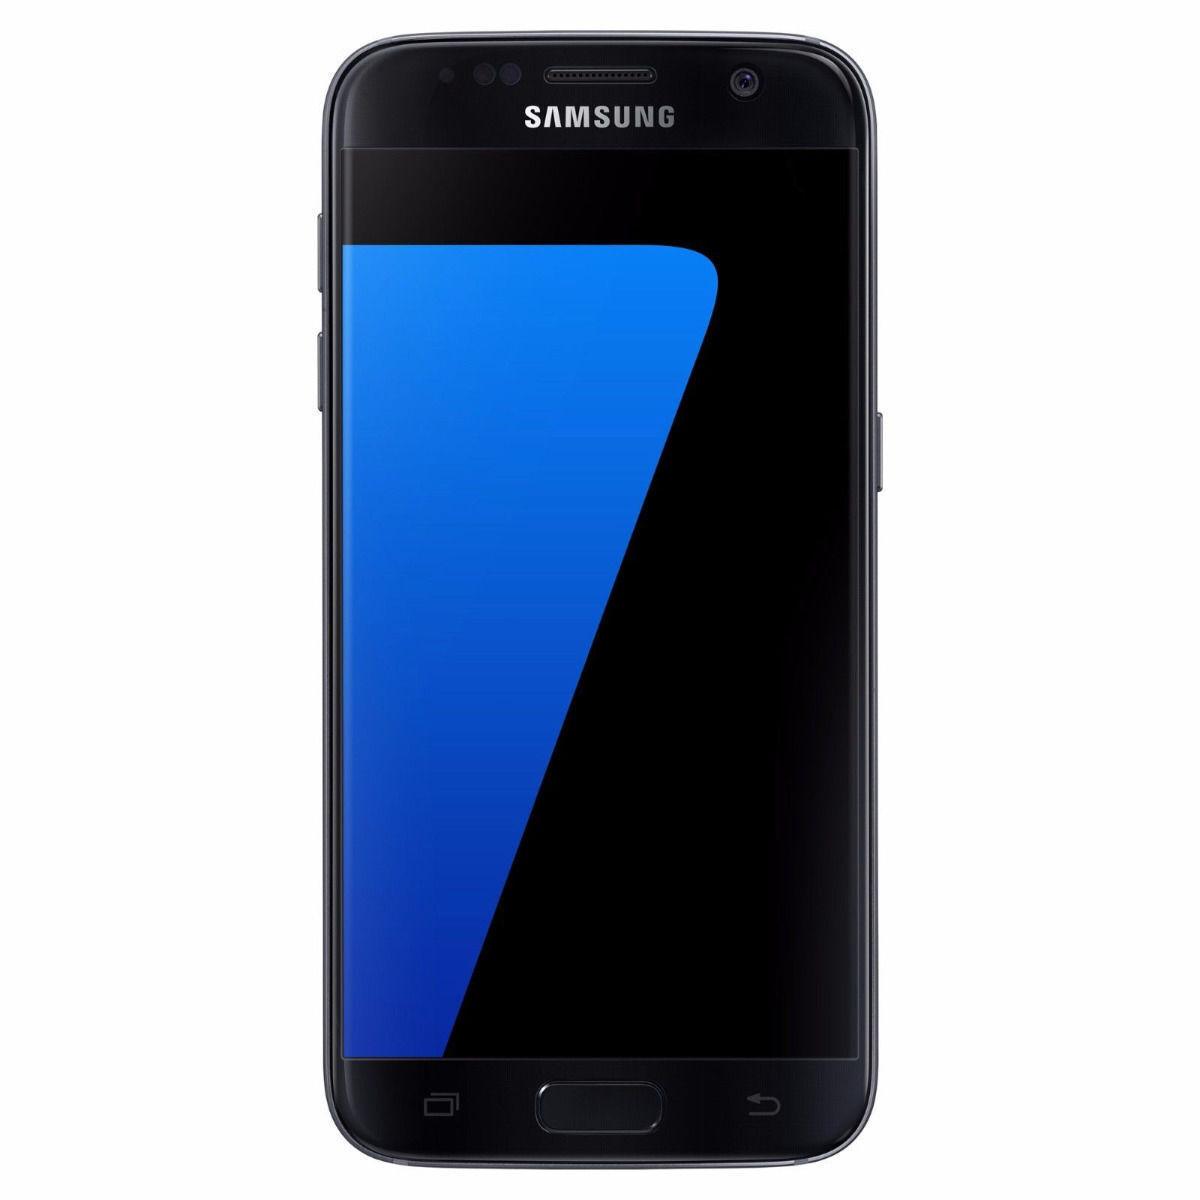 Samsung Galaxy S7 G930 32GB GSM UNLOCKED Refurbished GOLD/BLACK/SILVER 4G LTE B+